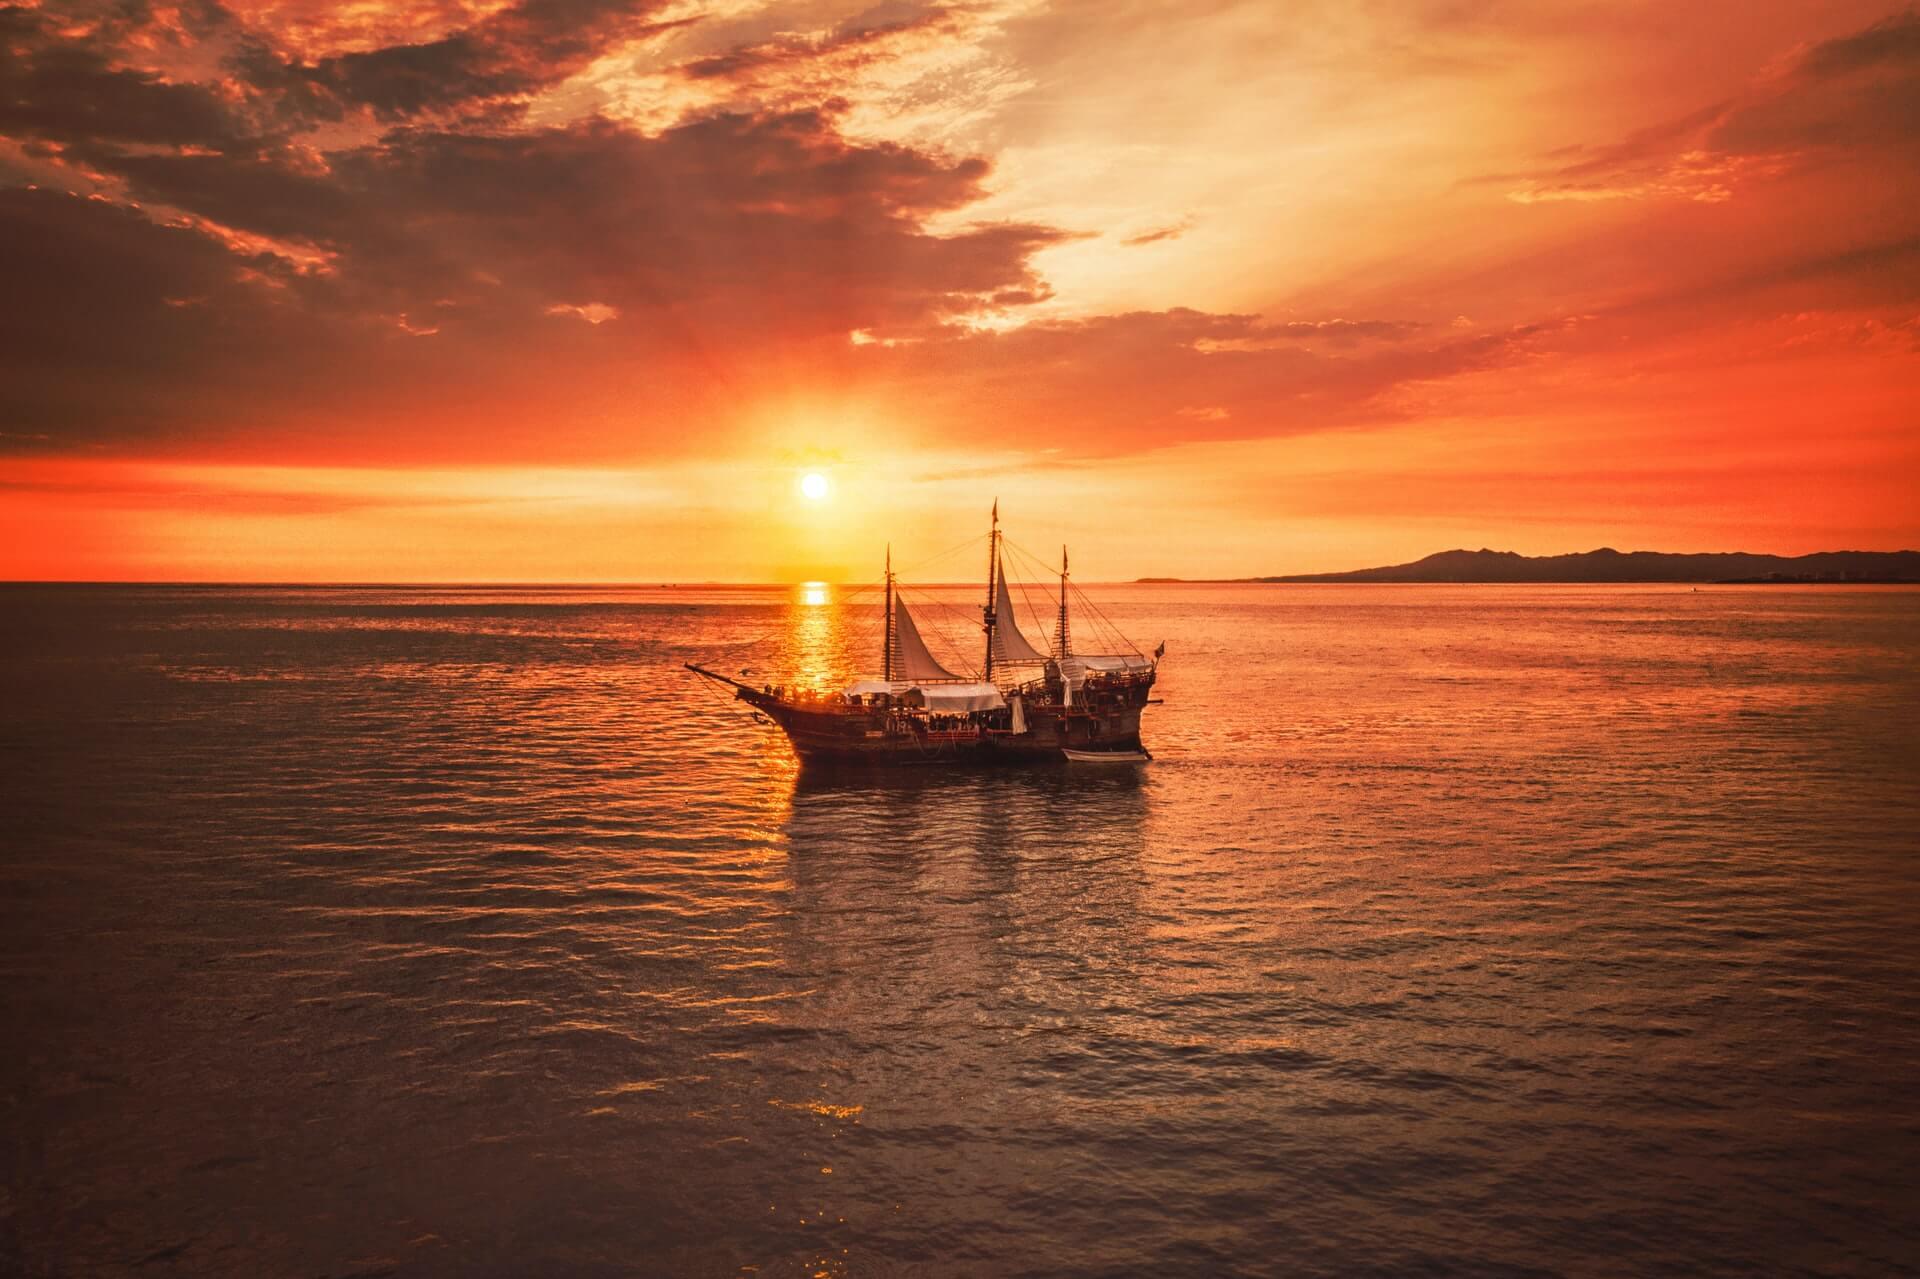 A sailboat mid-cruise on a sunset lake.